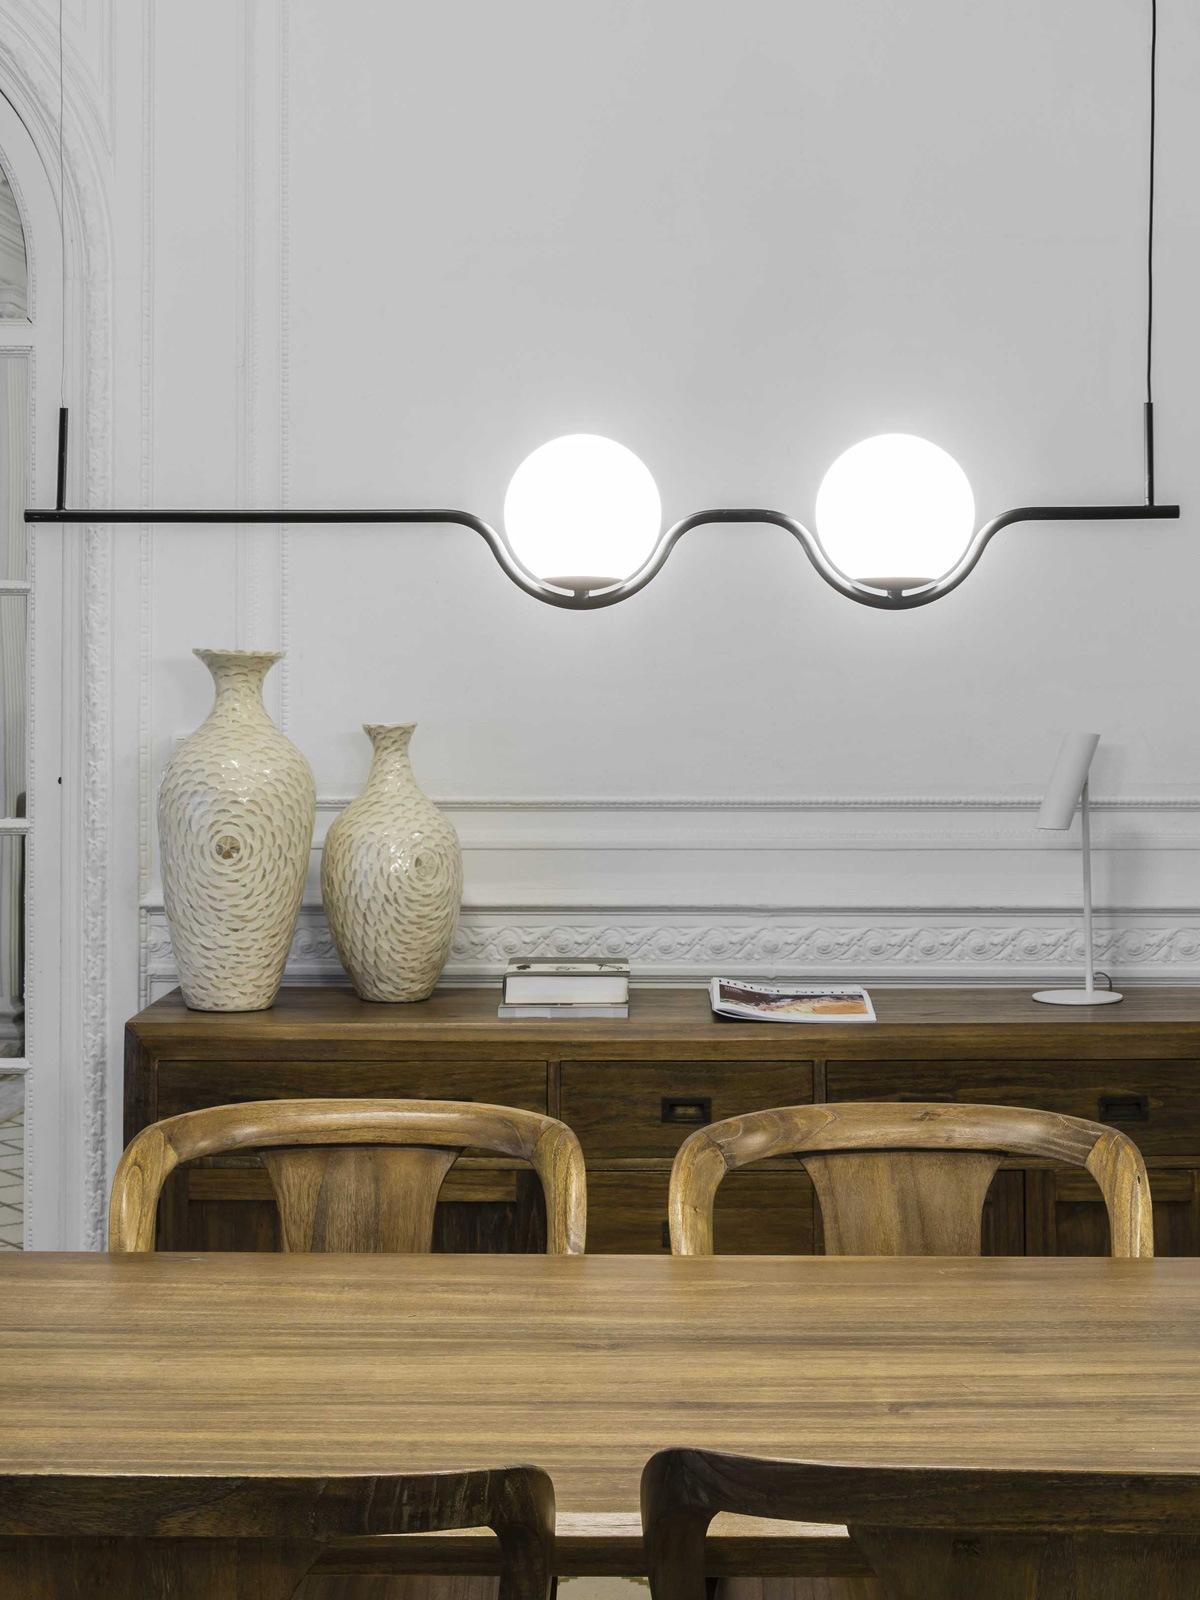 Faro Lampe Le Vita DesignOrt Onlineshop